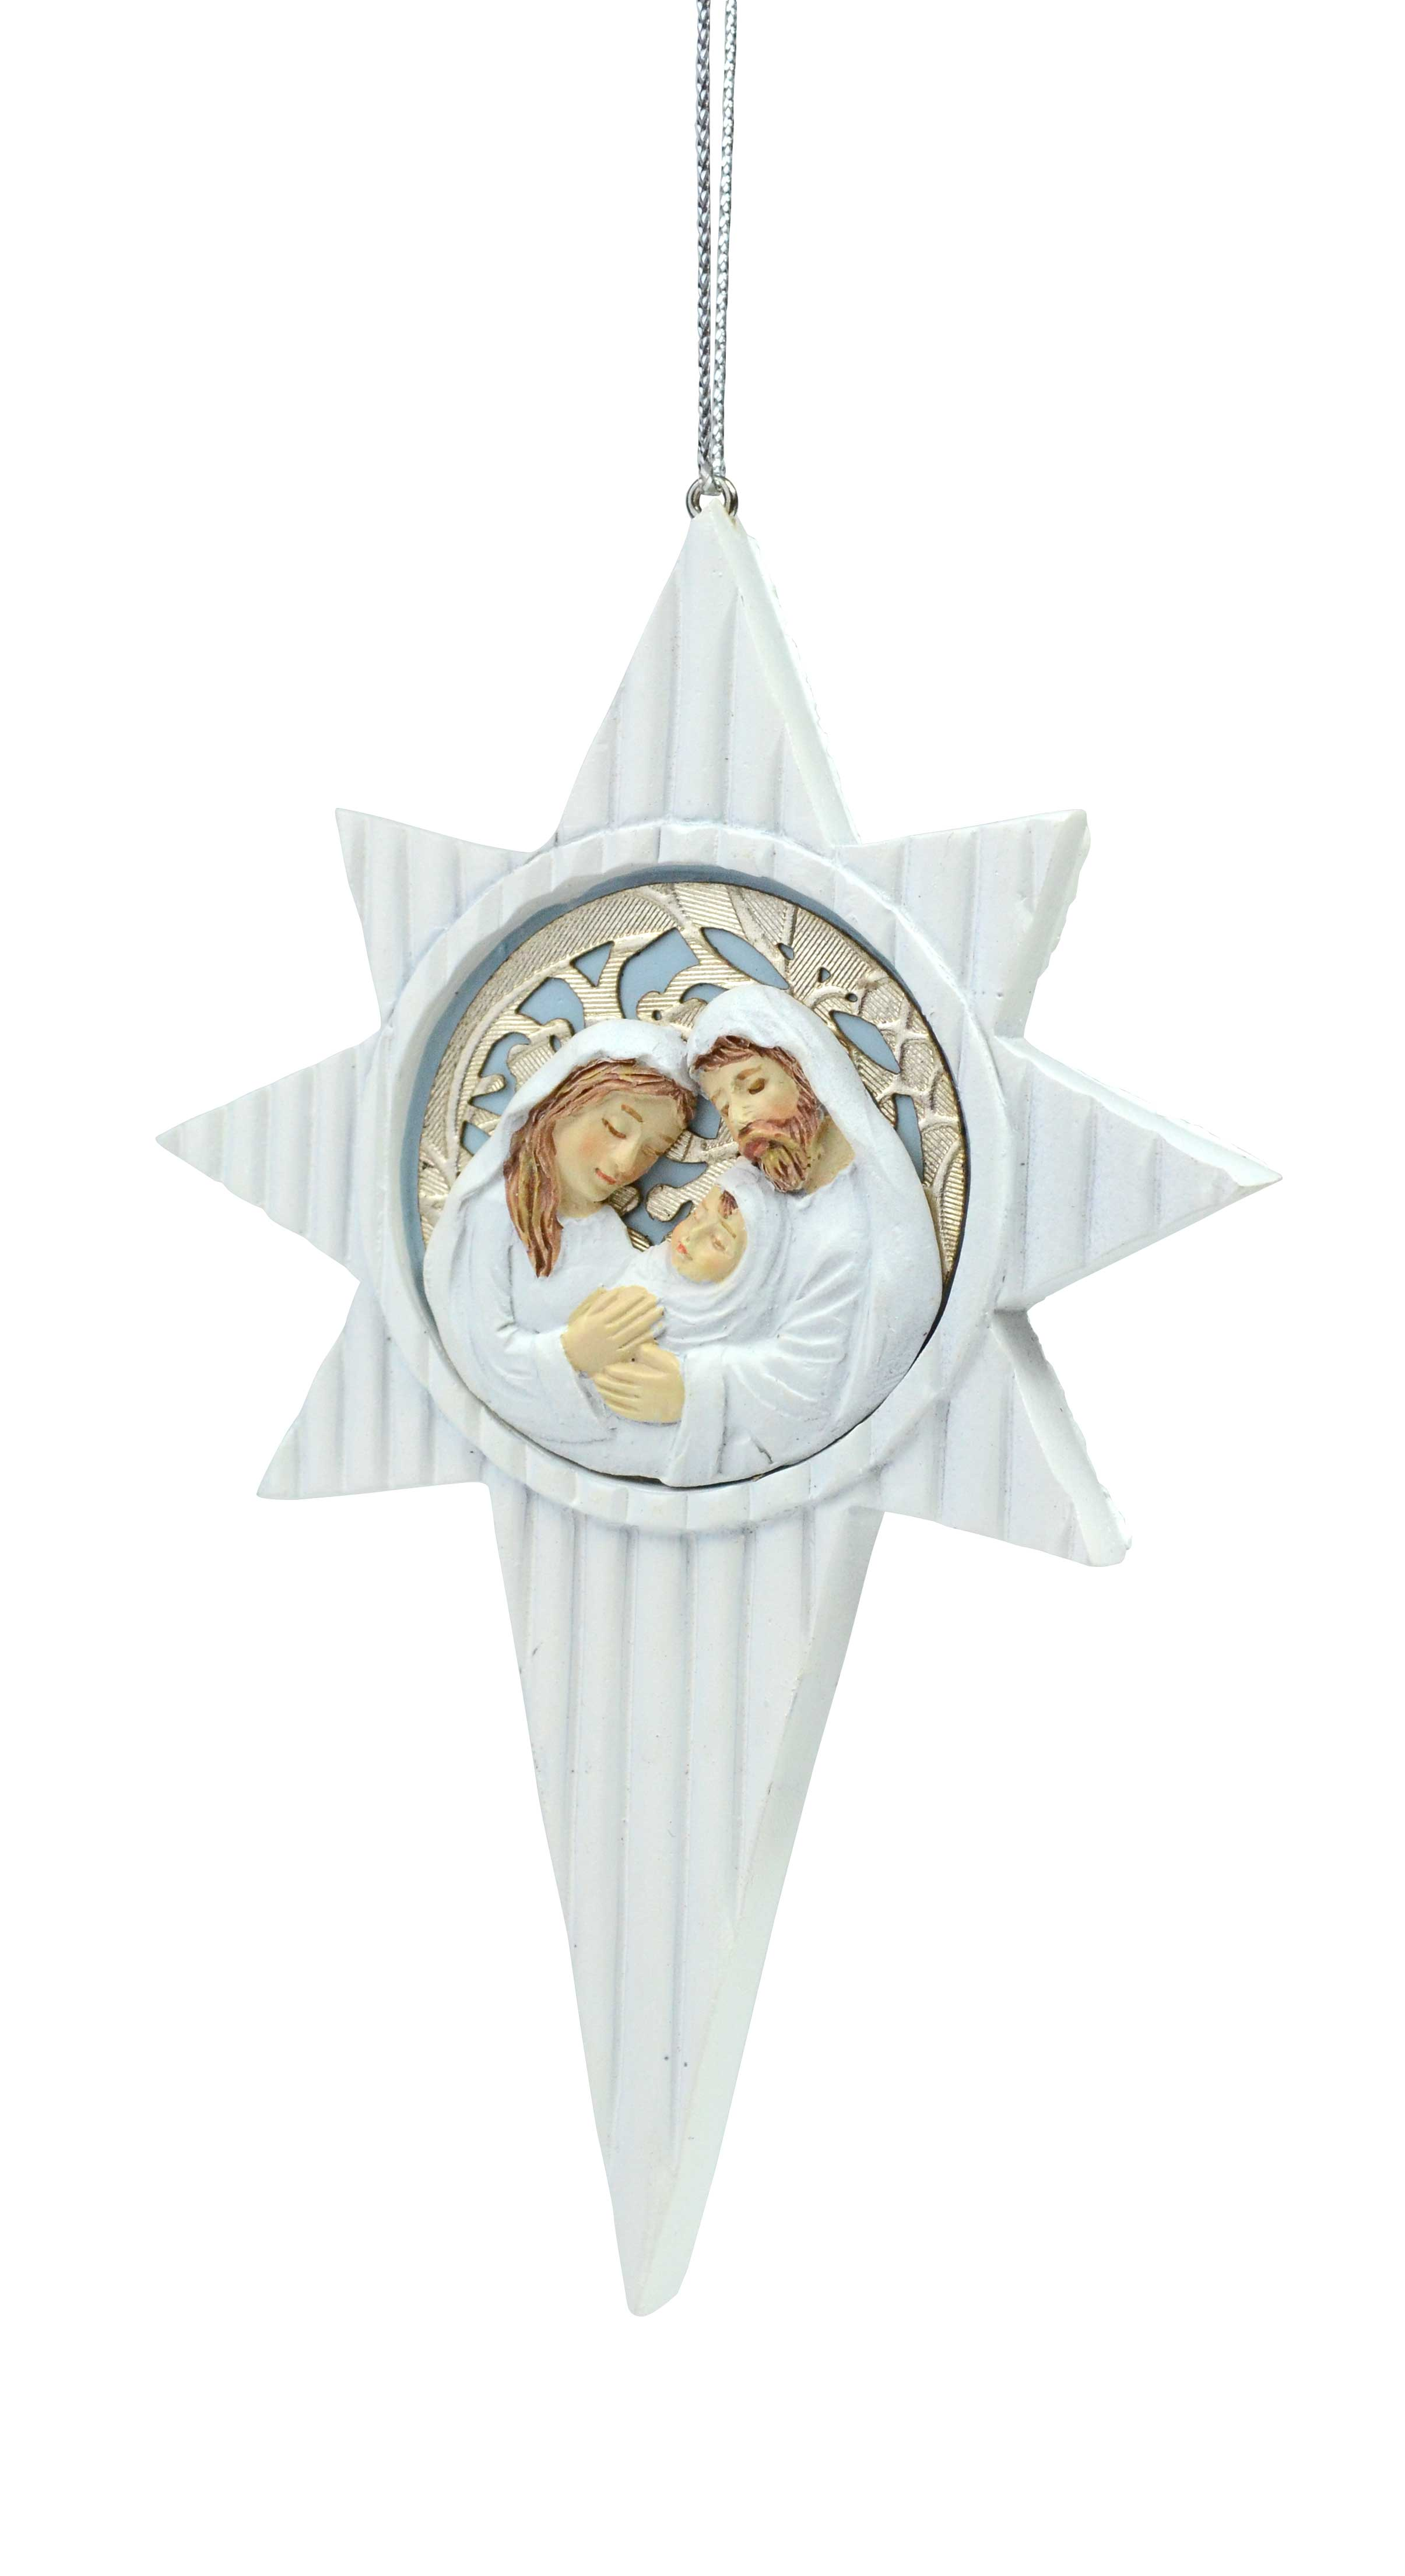 Bethlehem Star with Holy Family Ornament